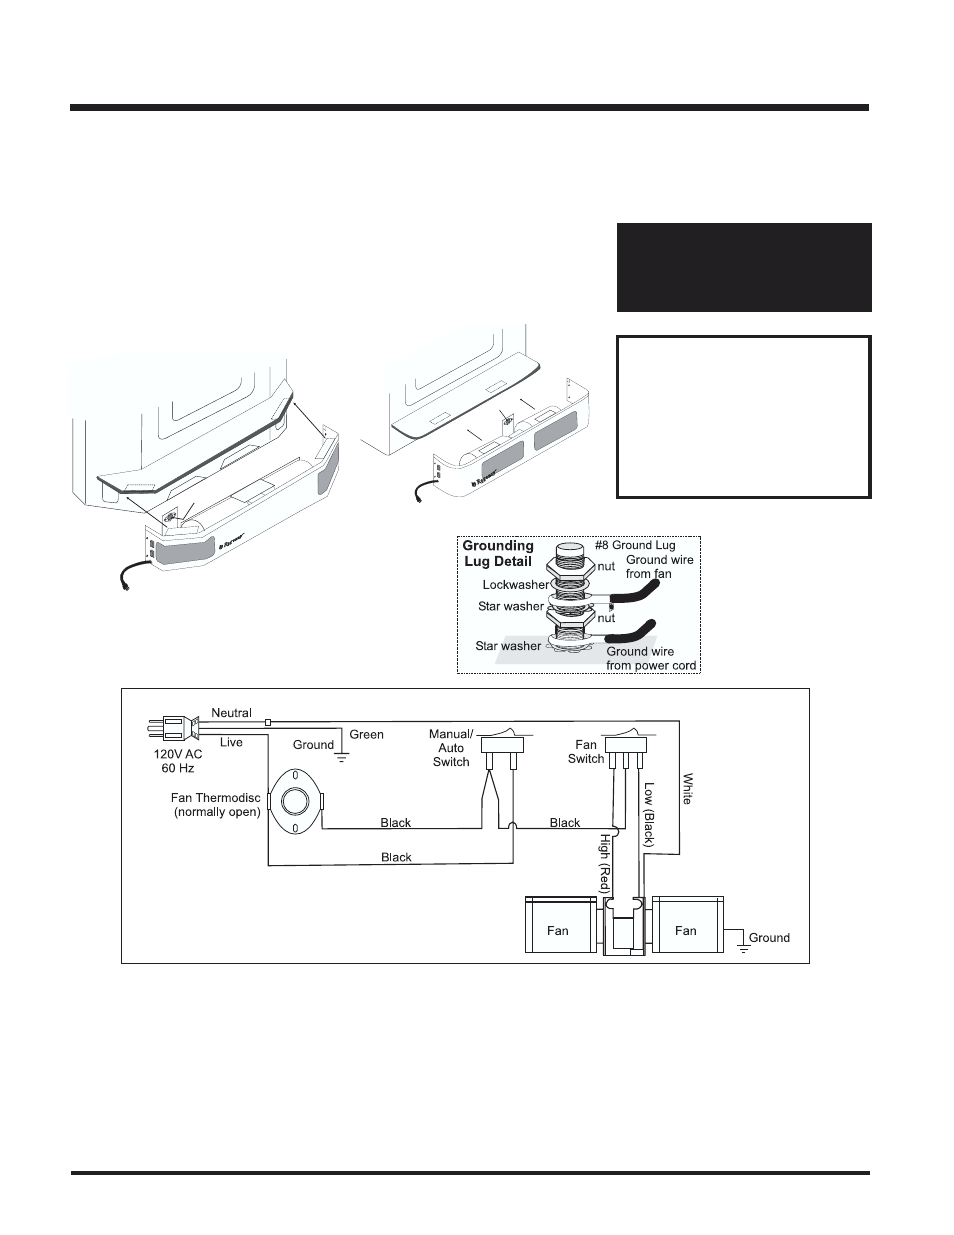 medium resolution of blower fan switch wiring